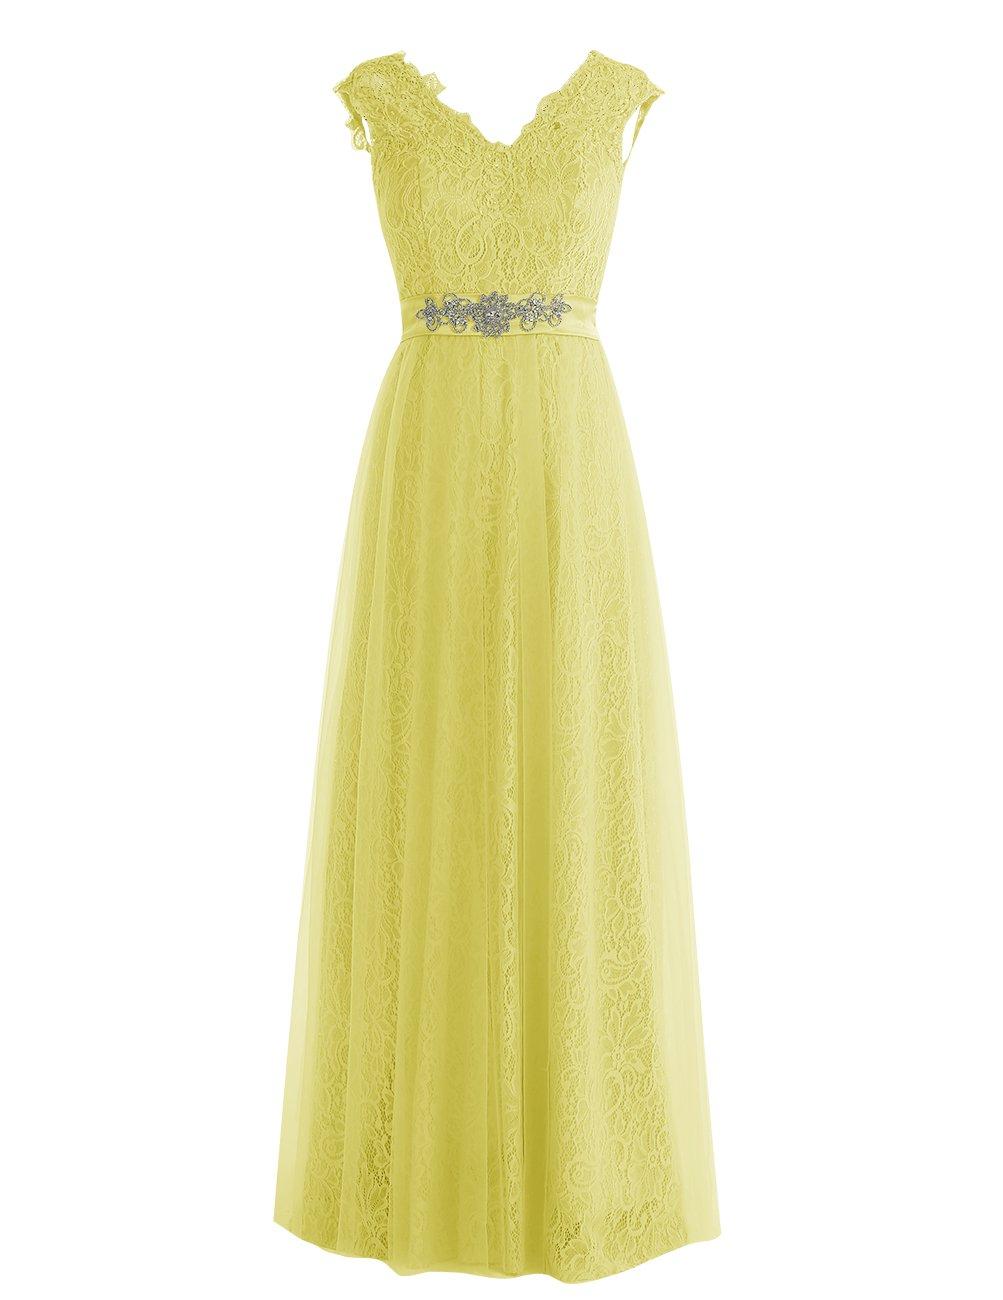 Dresstell レディーズ ロング丈 披露宴ドレス 結婚式ドレス 総レースのお呼ばれ フォーマルドレス キラキラビジュー付き ビスチェタイプ 編み上げの花嫁ワンピース 二次会ドレス ステージドレス B01LY7QTQ6 JP15|イエロー イエロー JP15